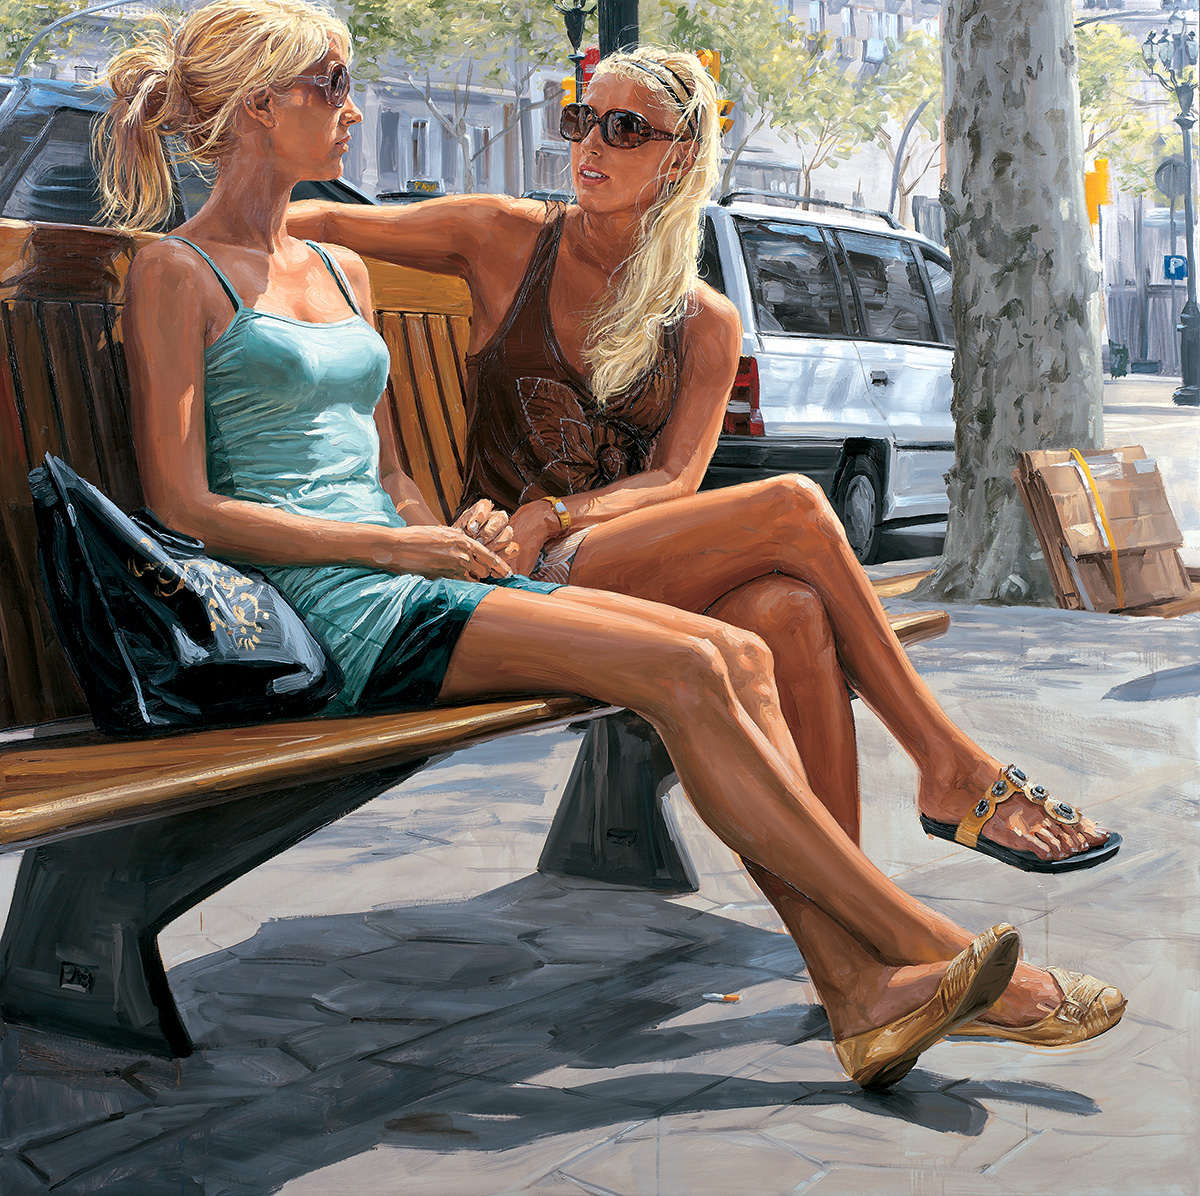 blonde-girls-urban-sunglasses.jpg